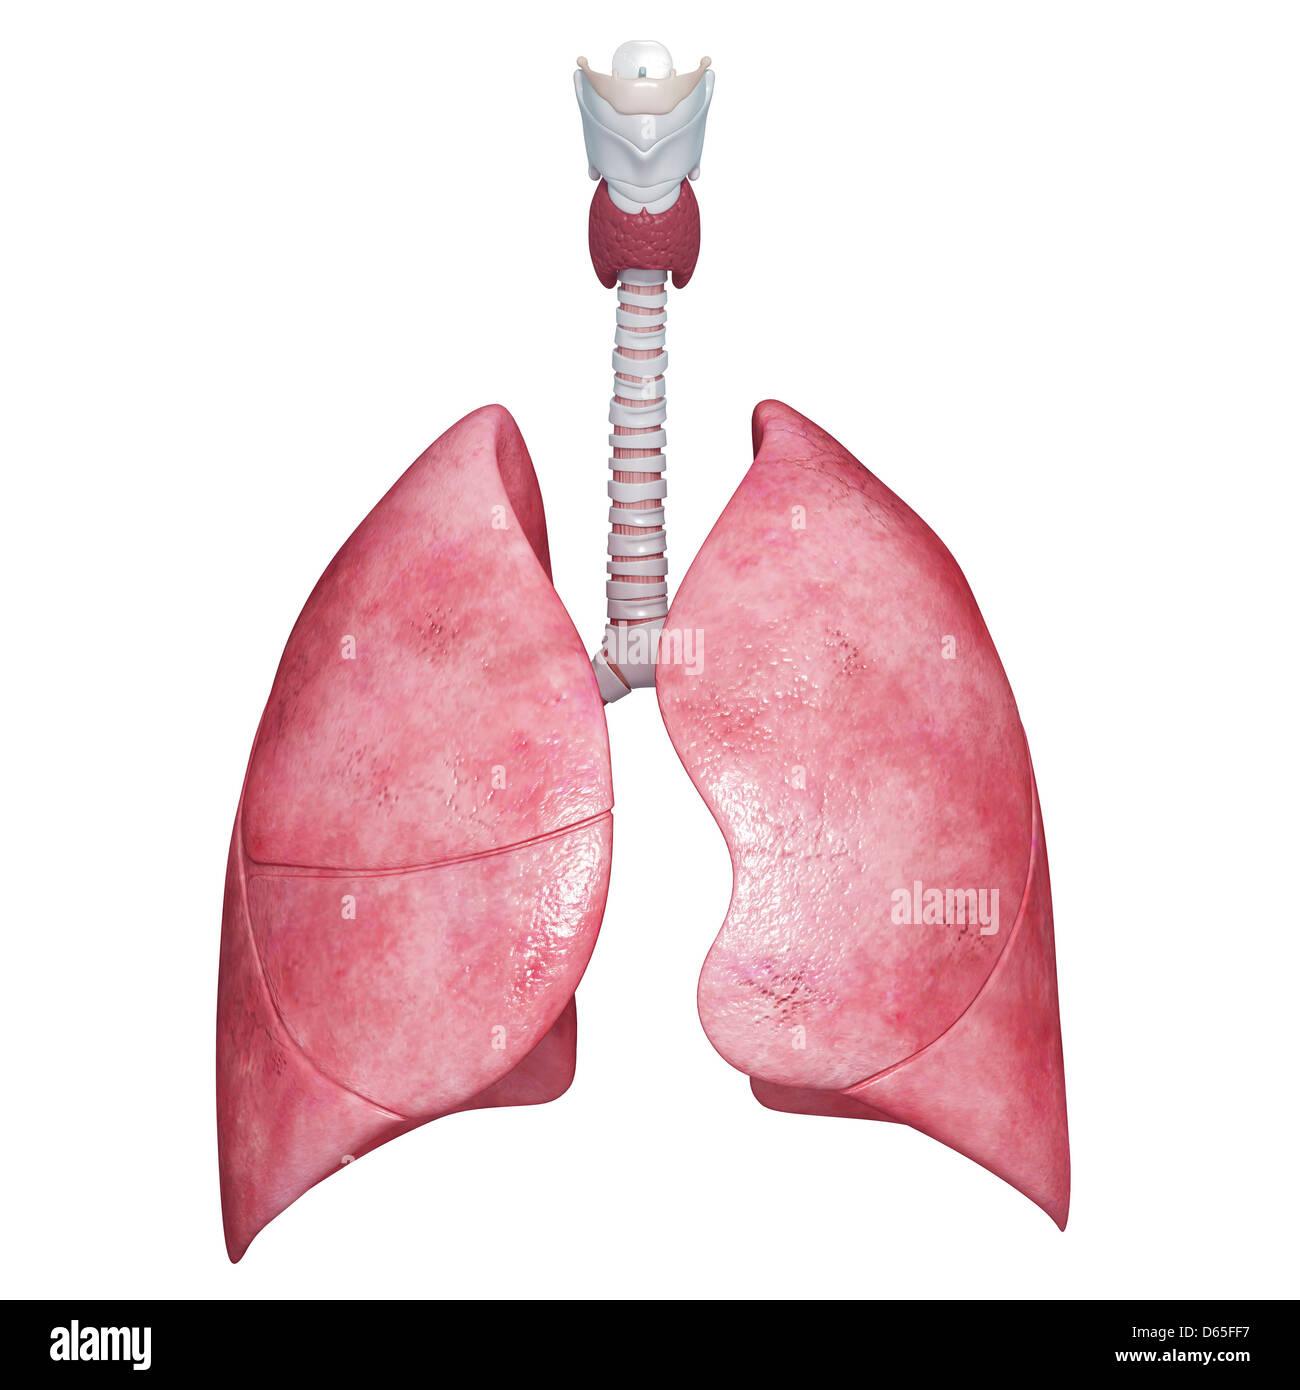 Human lungs, artwork - Stock Image